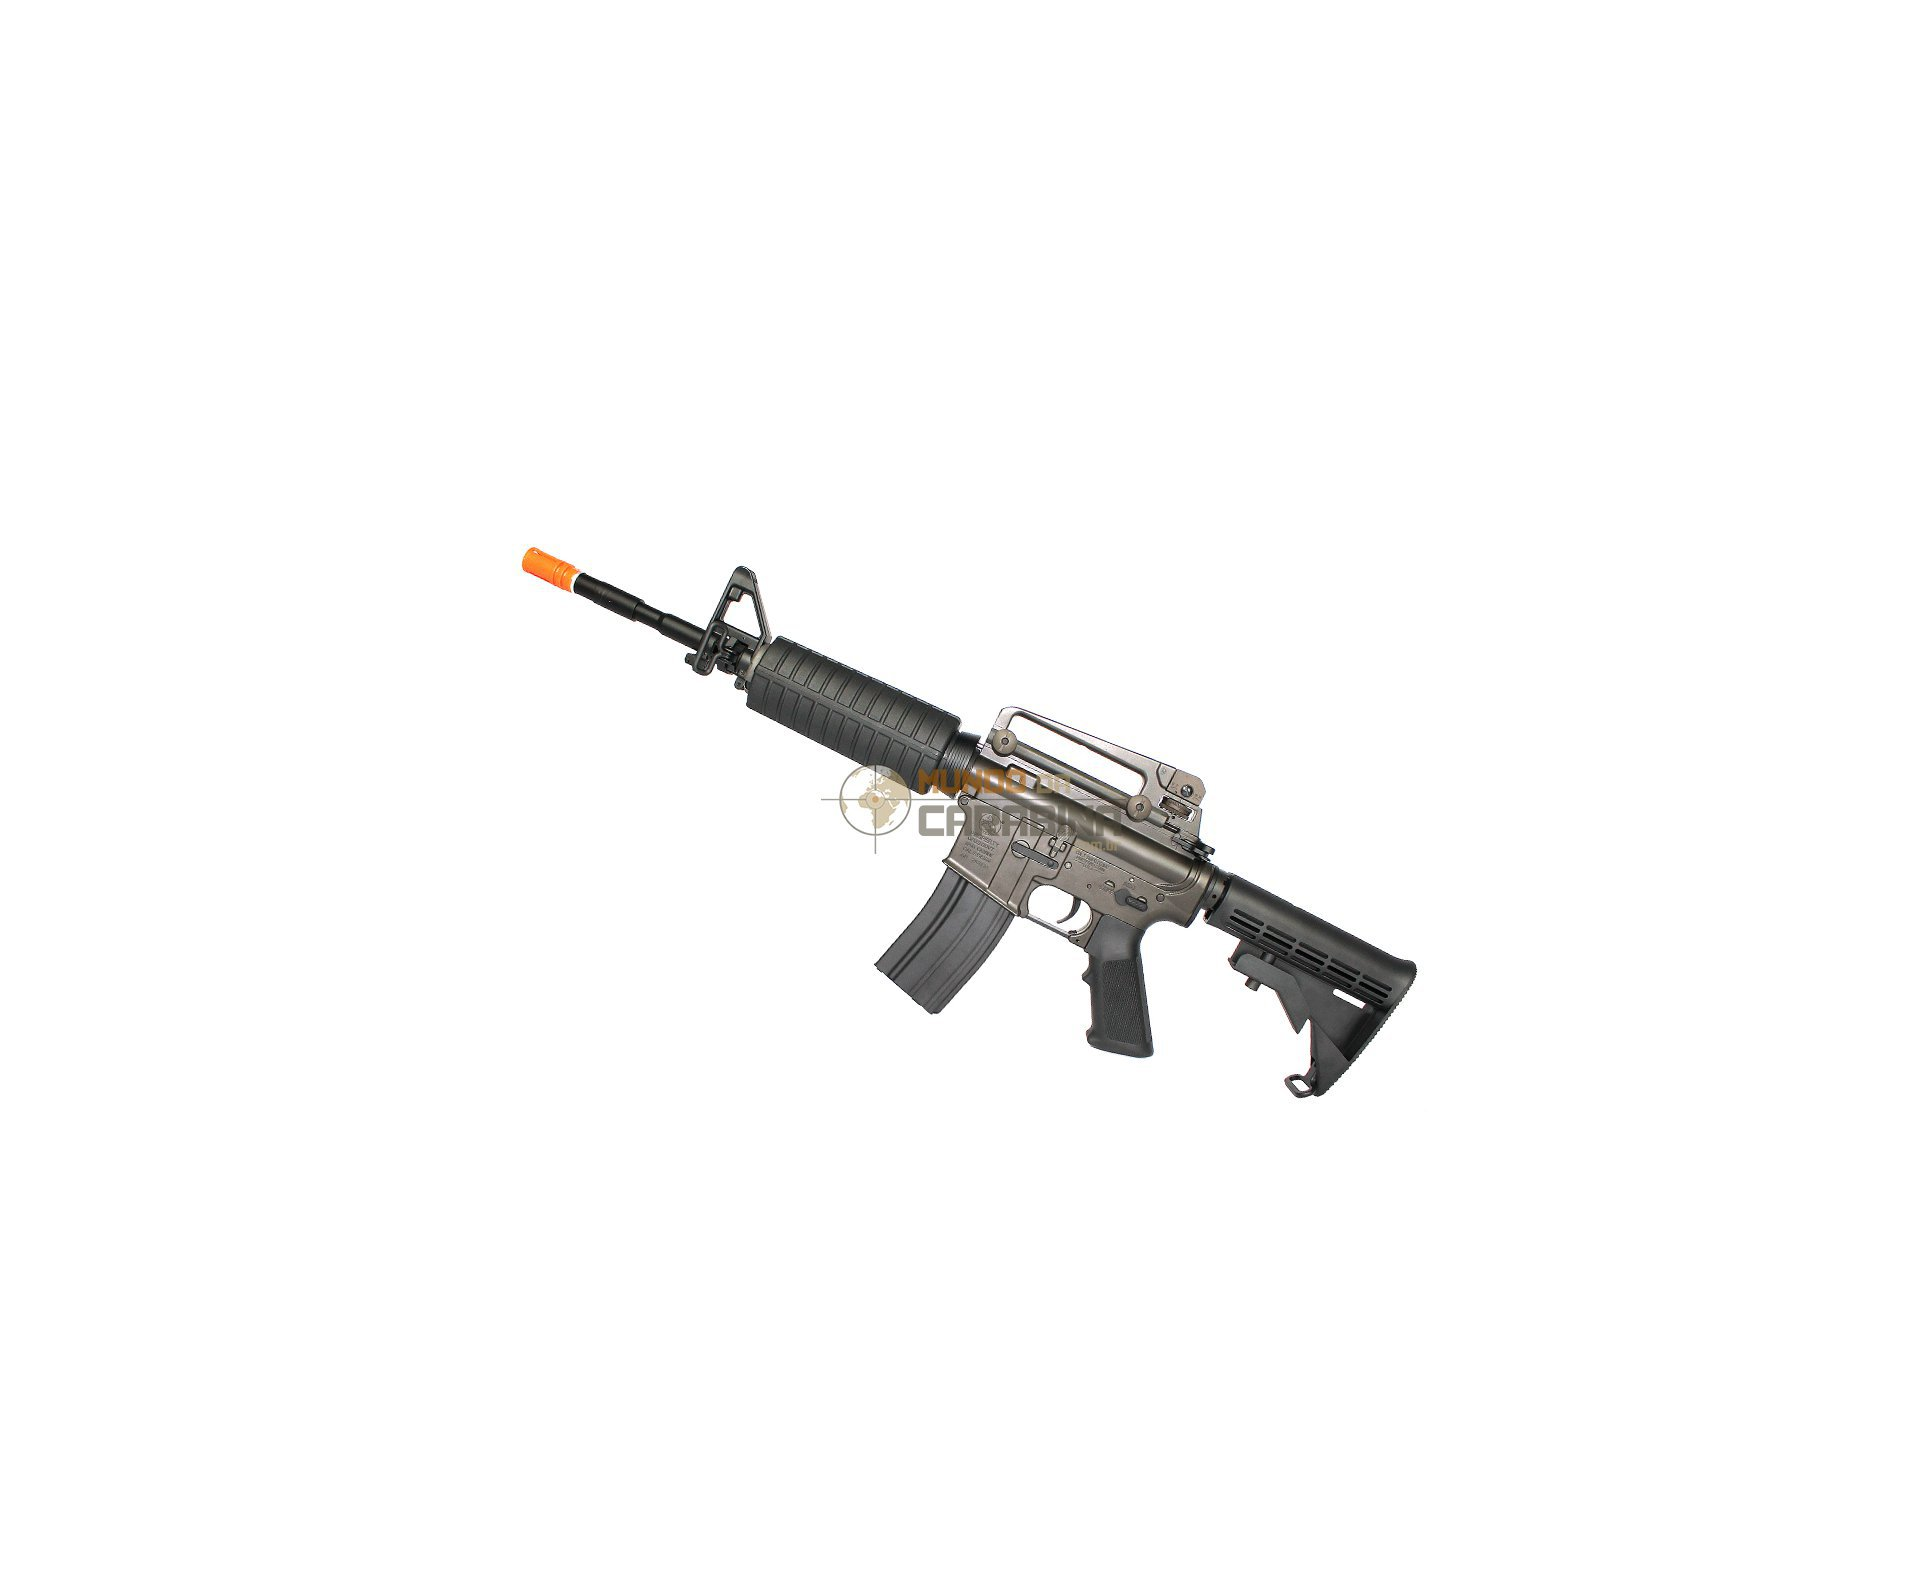 Rifle De Airsoft Colt M4a1 - Full Metal - Calibre 6,0 Mm - King Arms